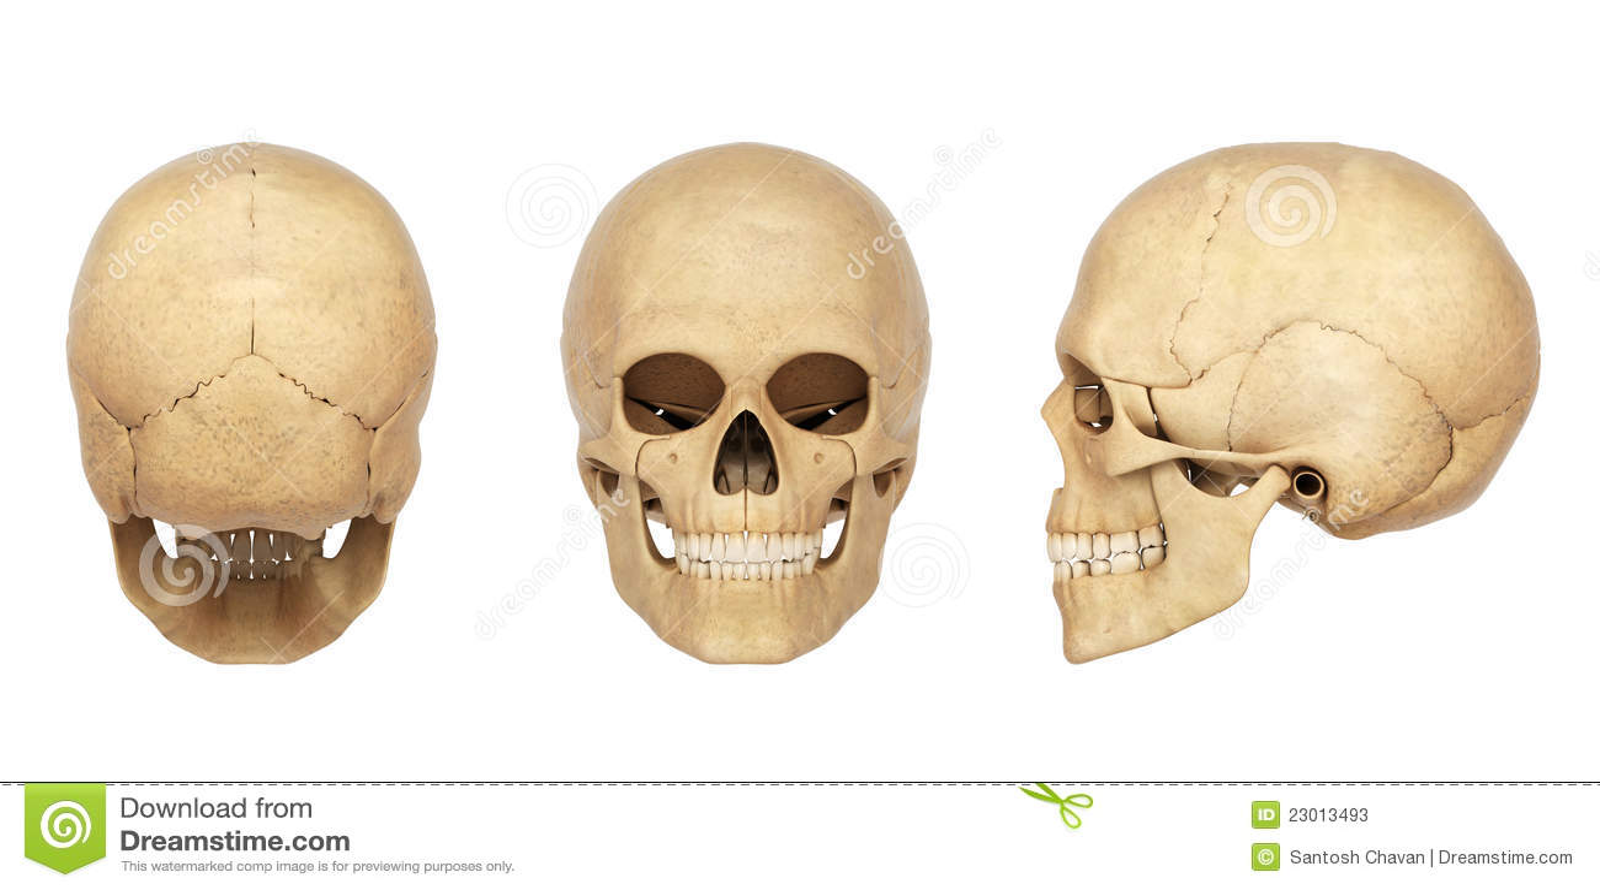 Skull Anatomy Hd Wallpapers Plus